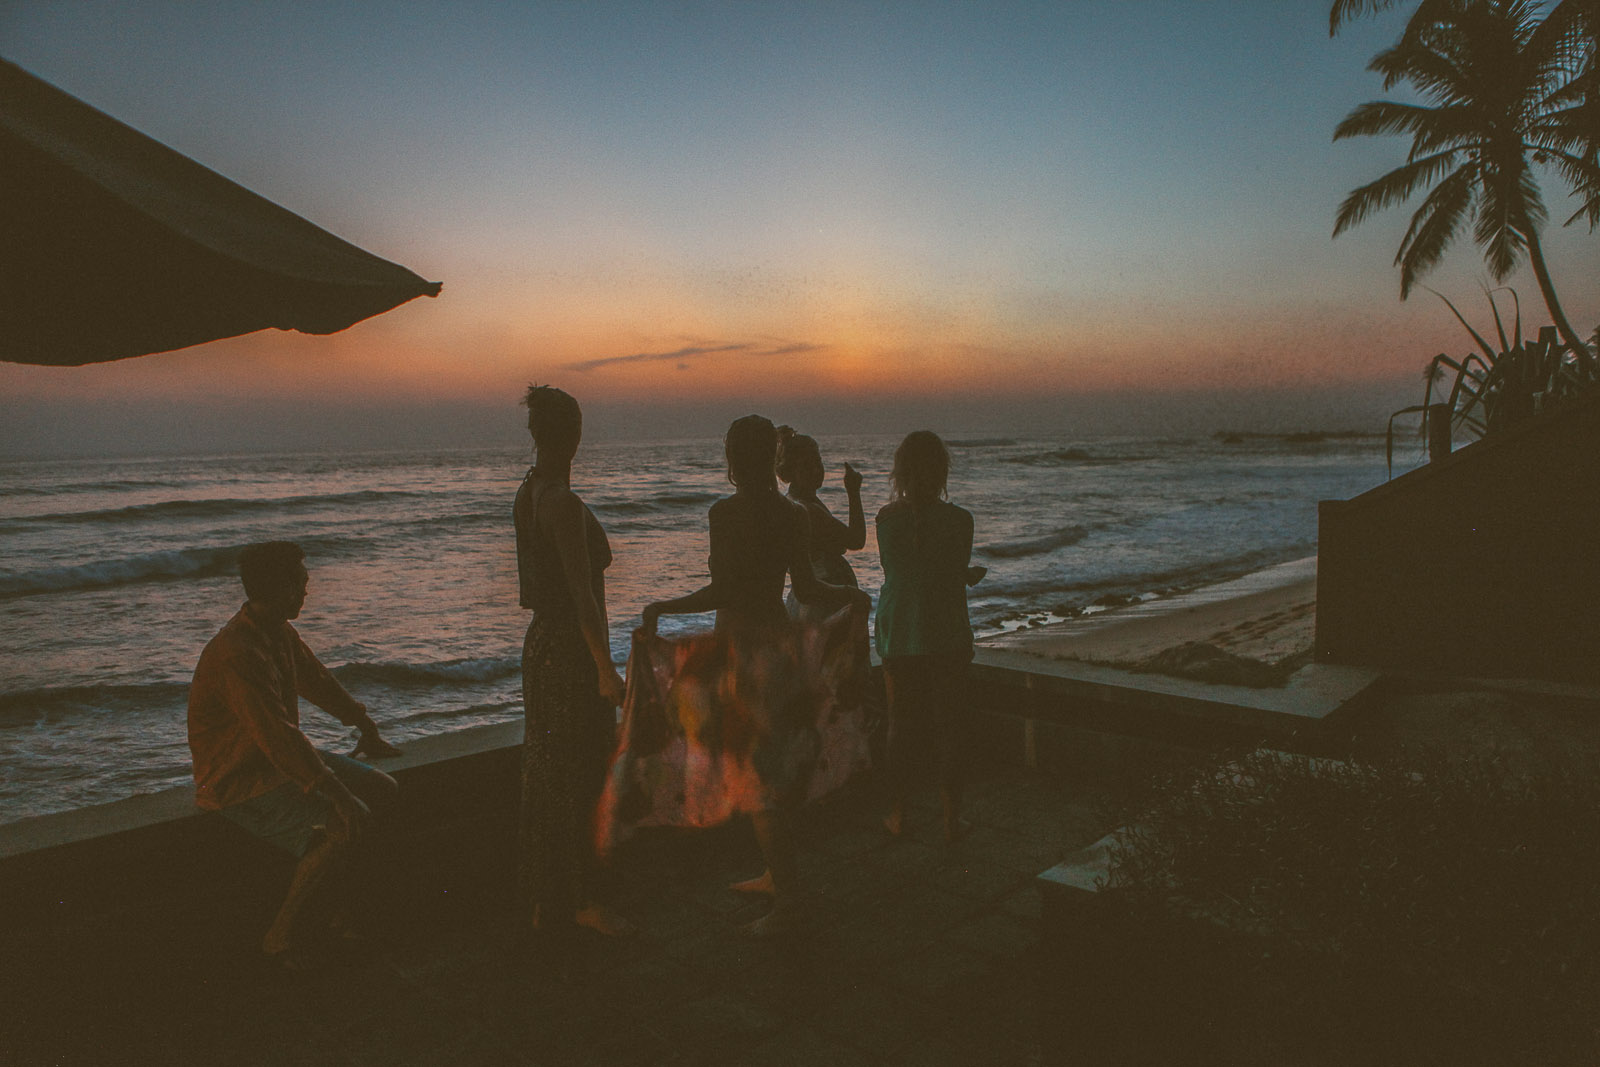 Sri Lanka-Hikkaduwa-Midigama-thalpe-era-beach-jetwing-surf-travel-blog-IMG_8826